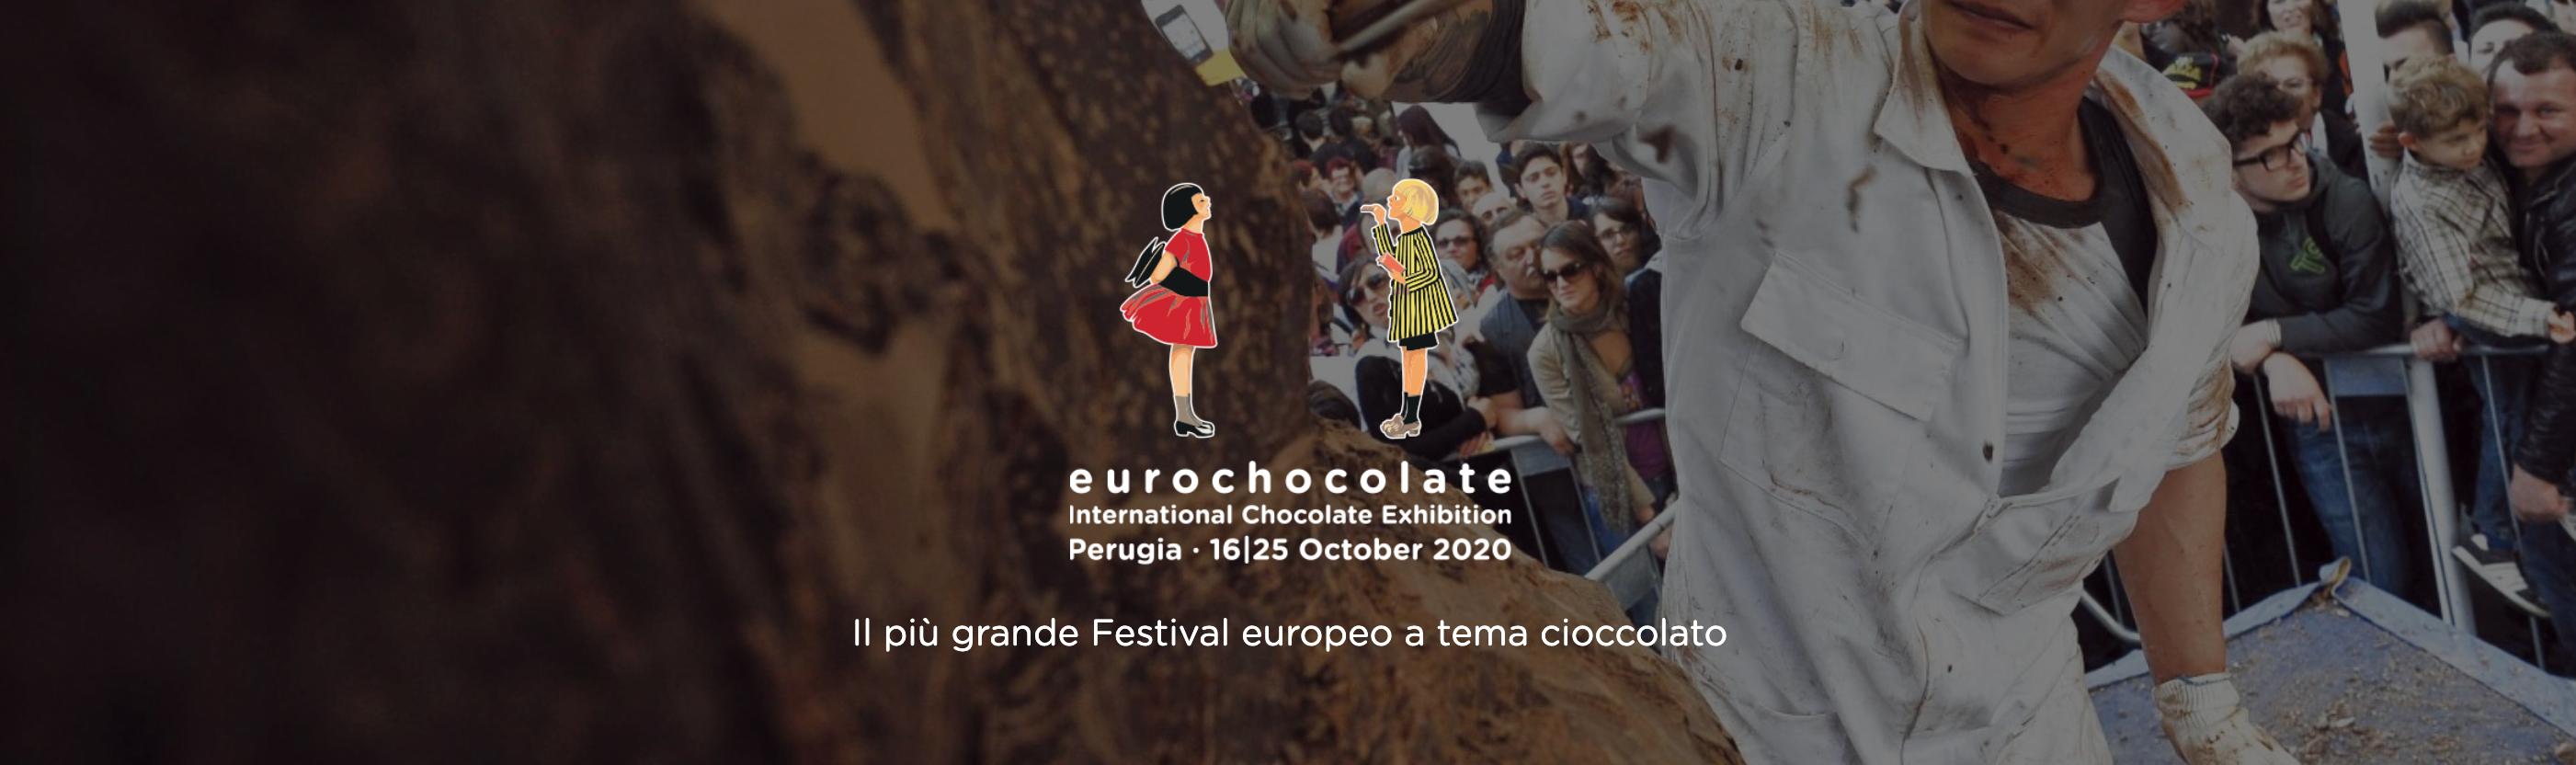 Eurochocolate 2020 | Dal 16 al 25 Ottobre 2020 a Perugia